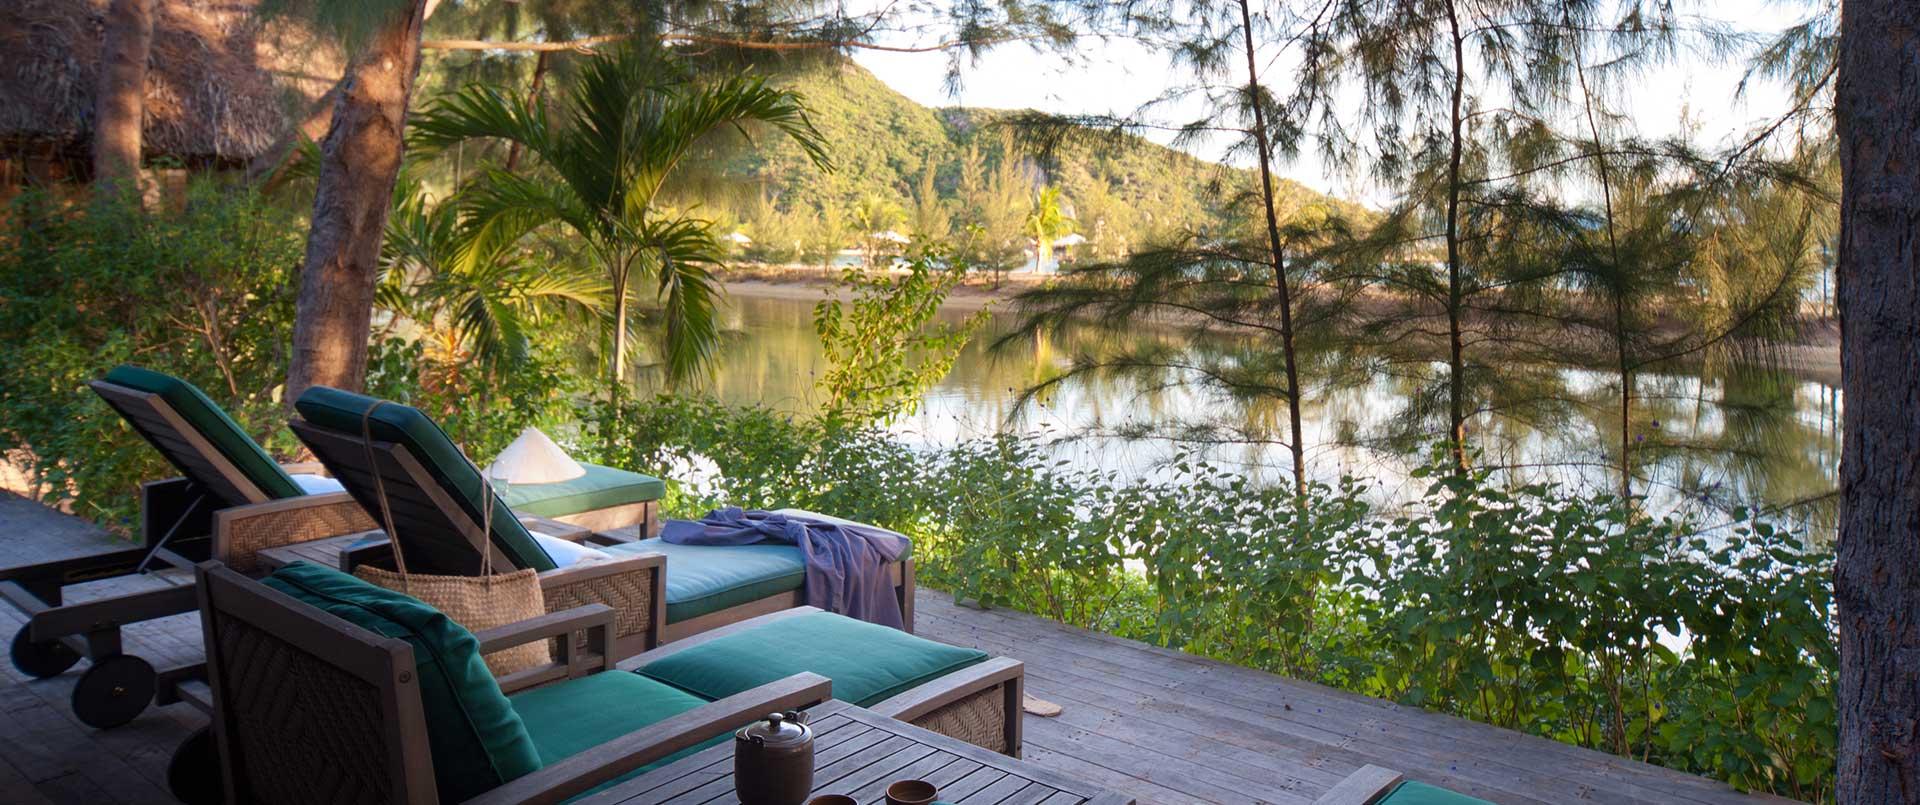 L'Alyana Resort, Vietnam